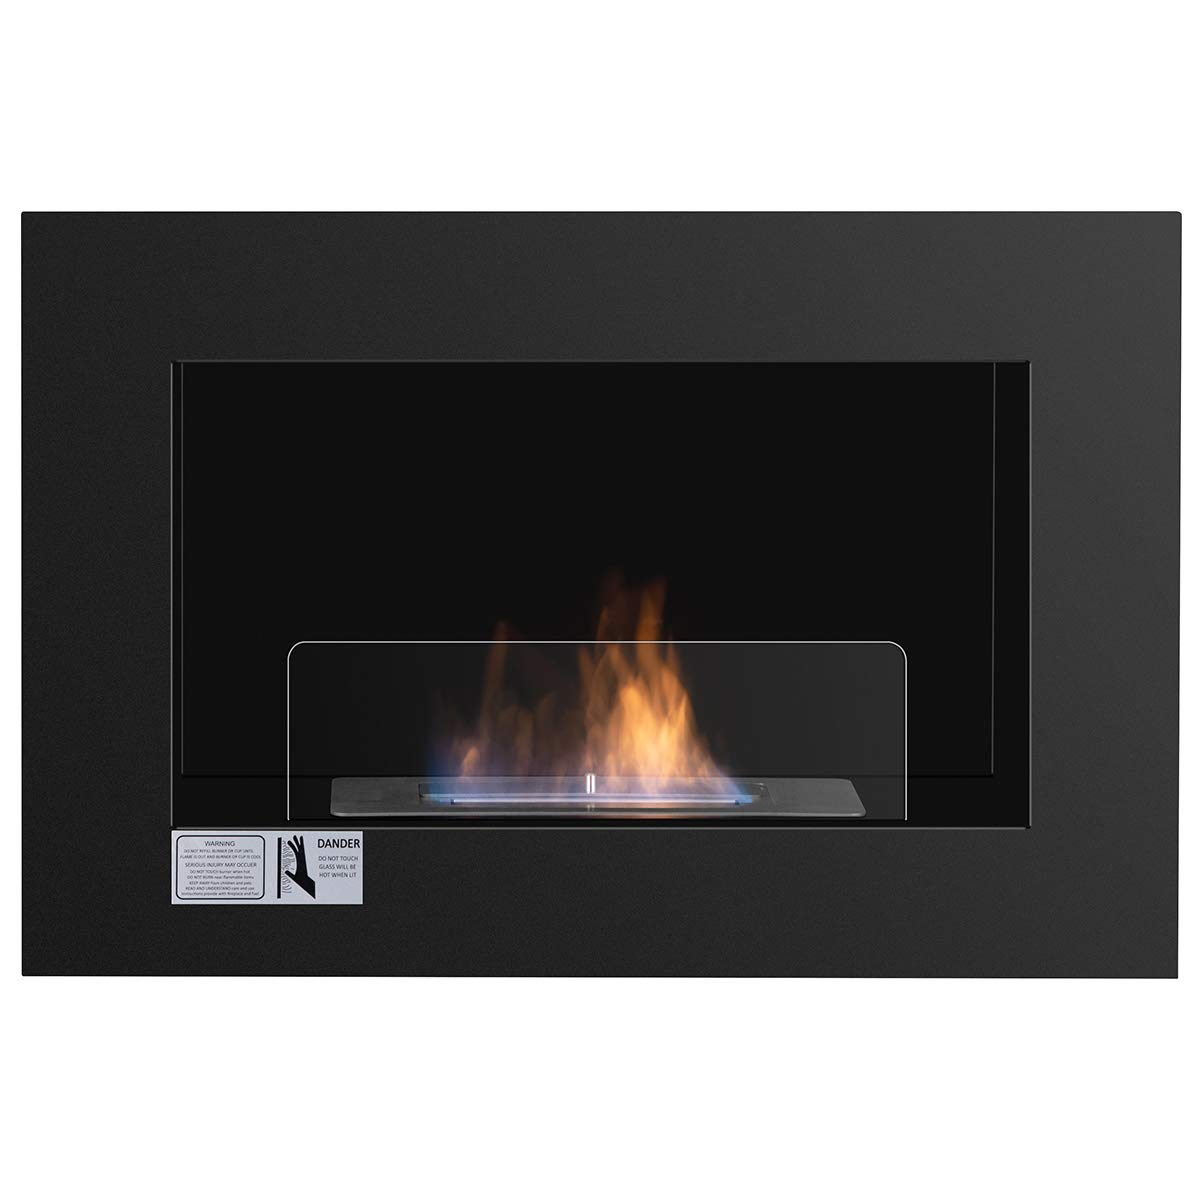 Tangkula 27.5'' Wall Mounted Bio-Ethanol Fireplace Ventless Hanging Fireplace Burner Tabletop Fireplace by Tangkula